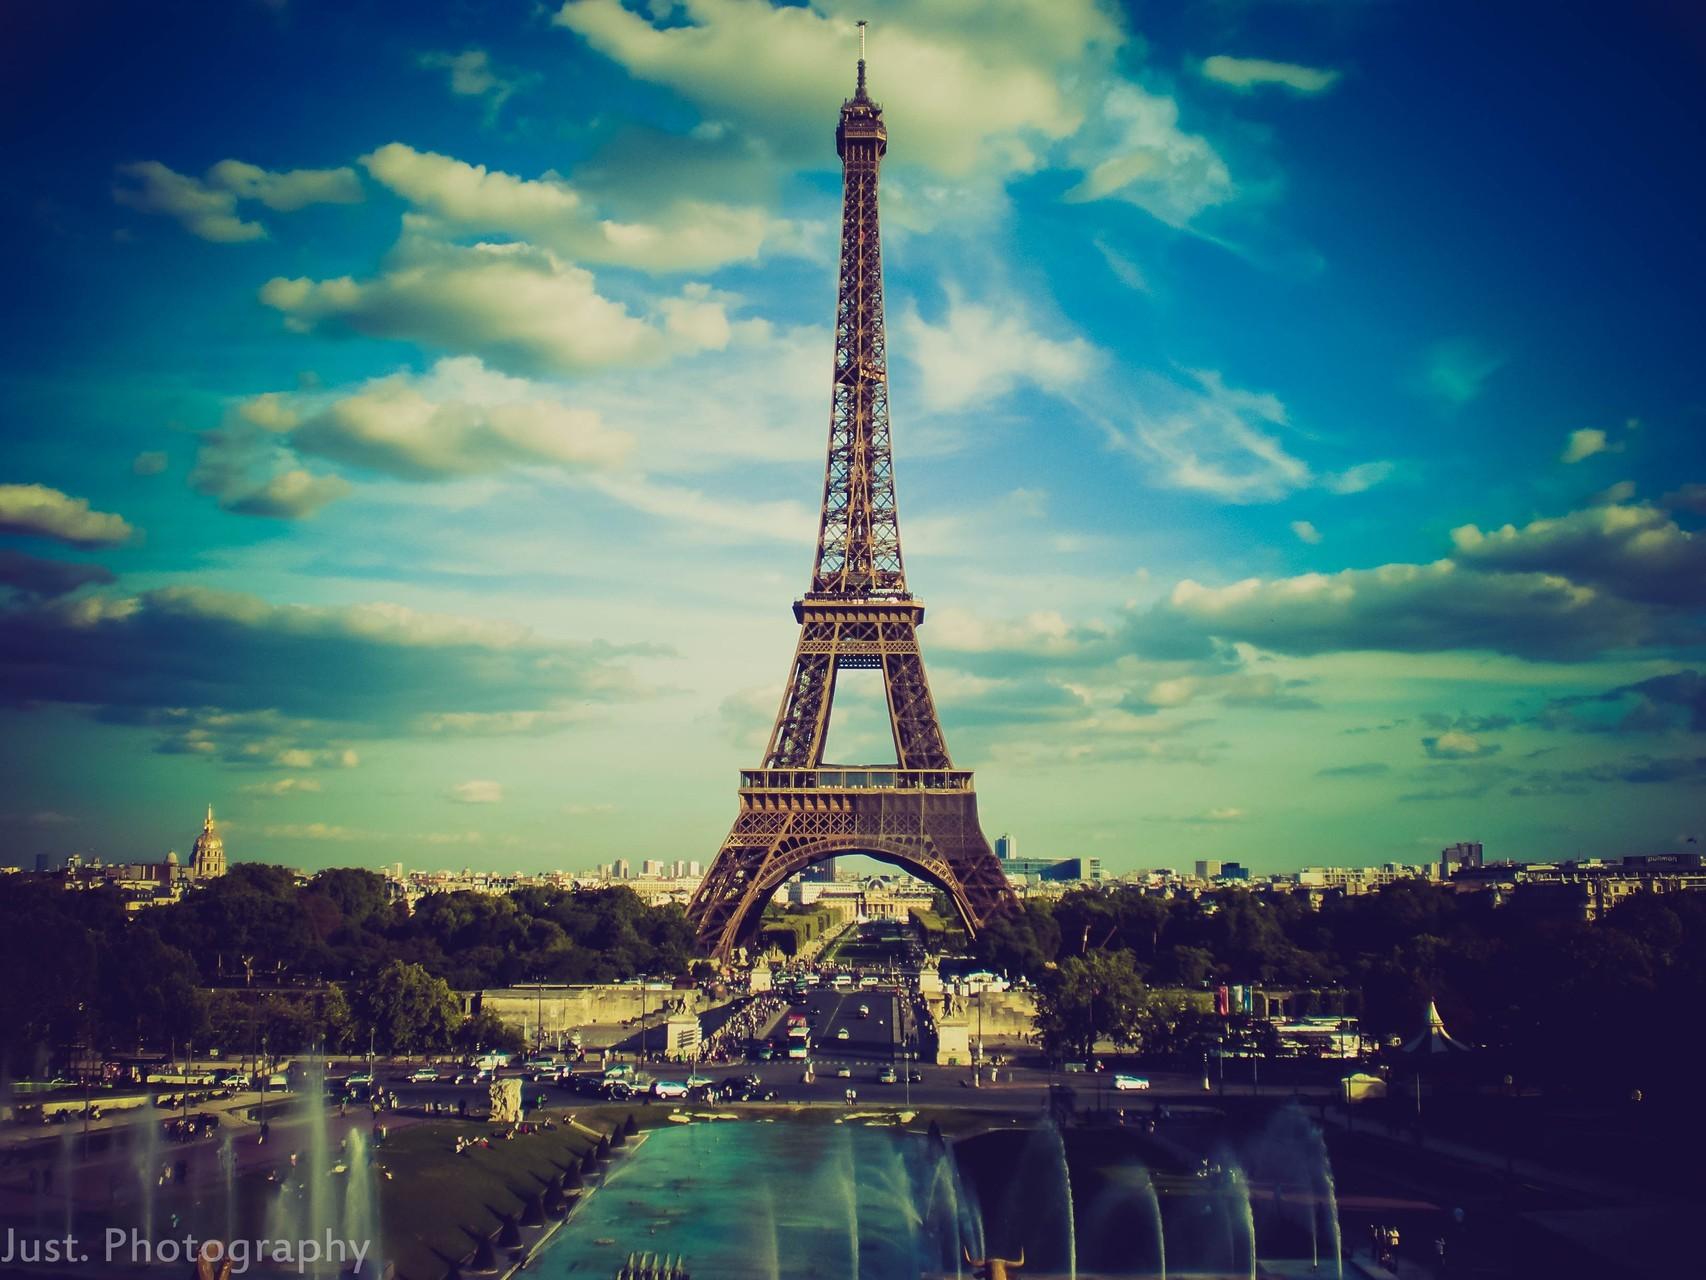 Cute Eiffel Tower Wallpaper For Iphone Fondos De Pantalla Ciudad Paisaje Urbano Noche